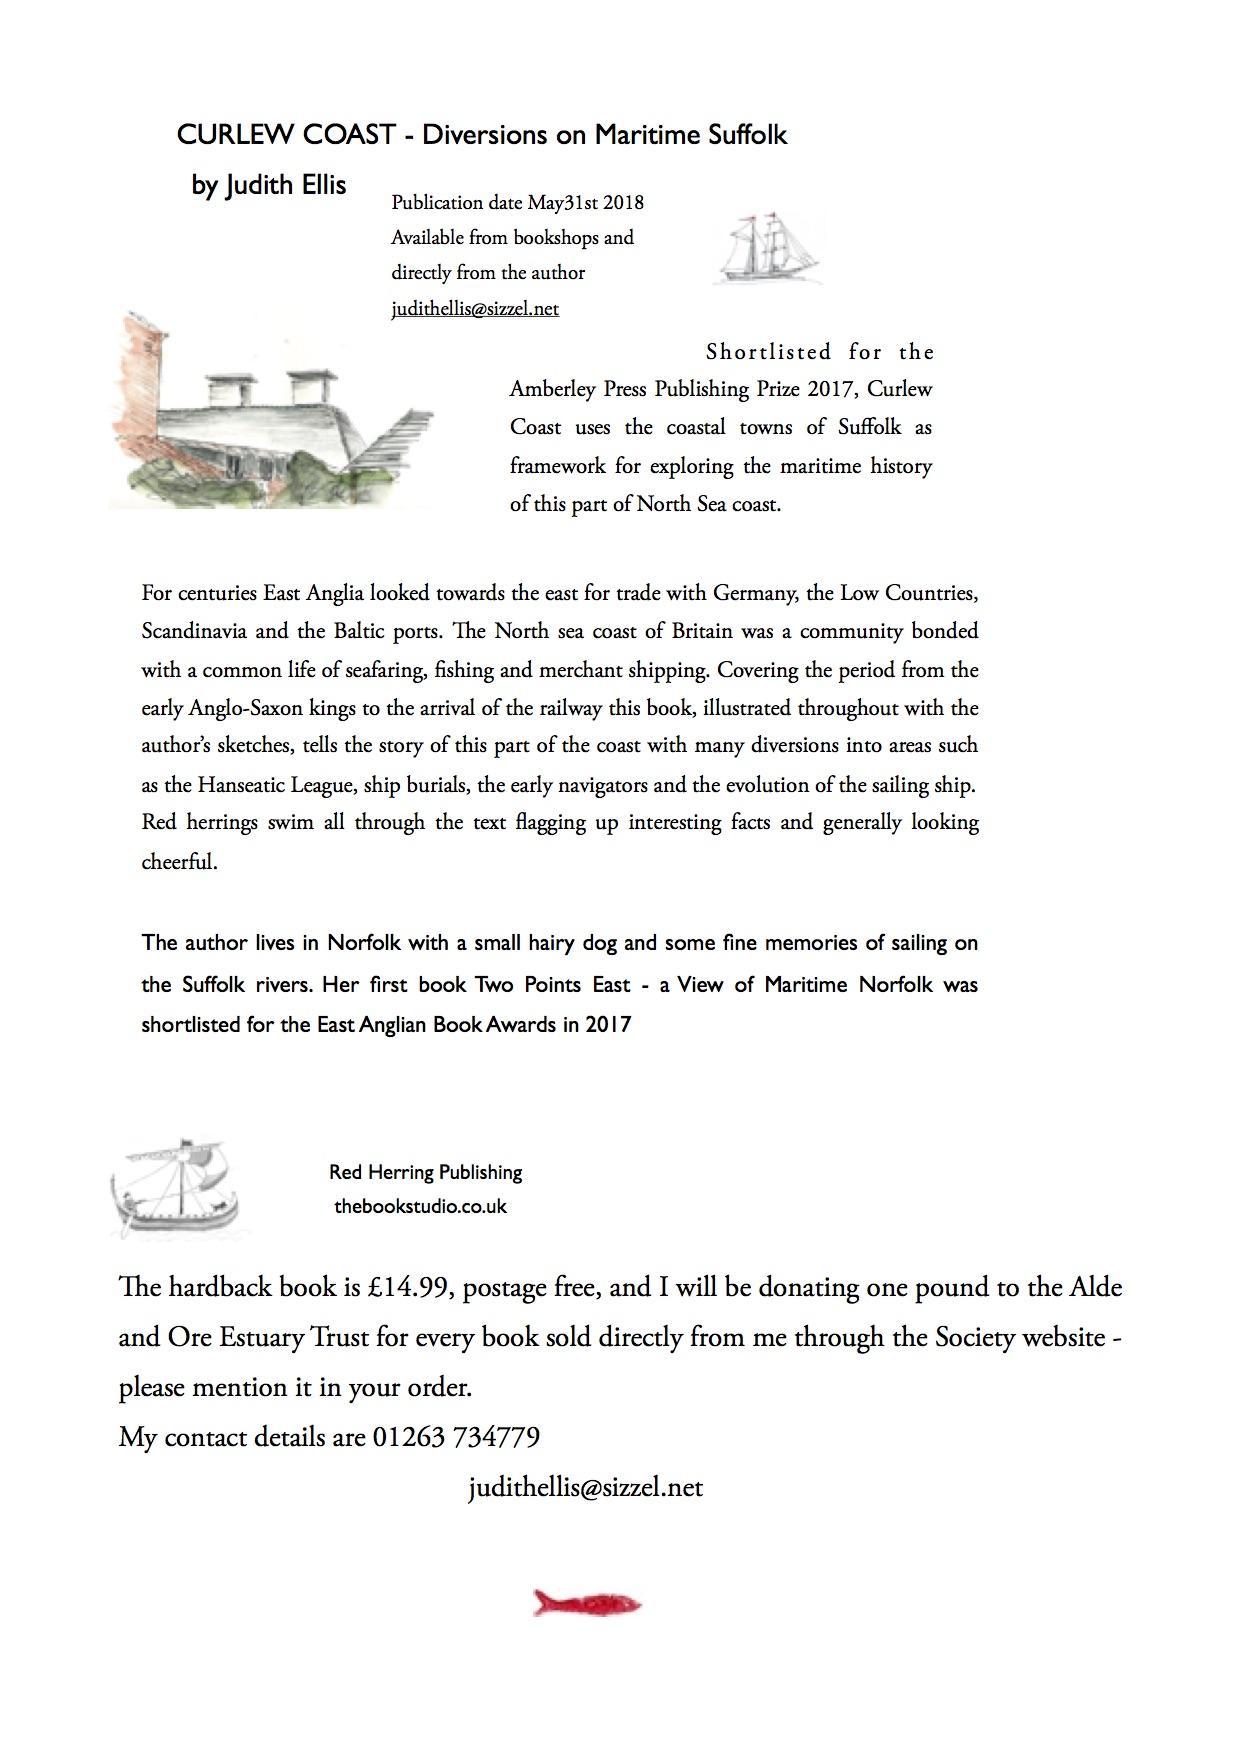 curlew flyer final.jpg